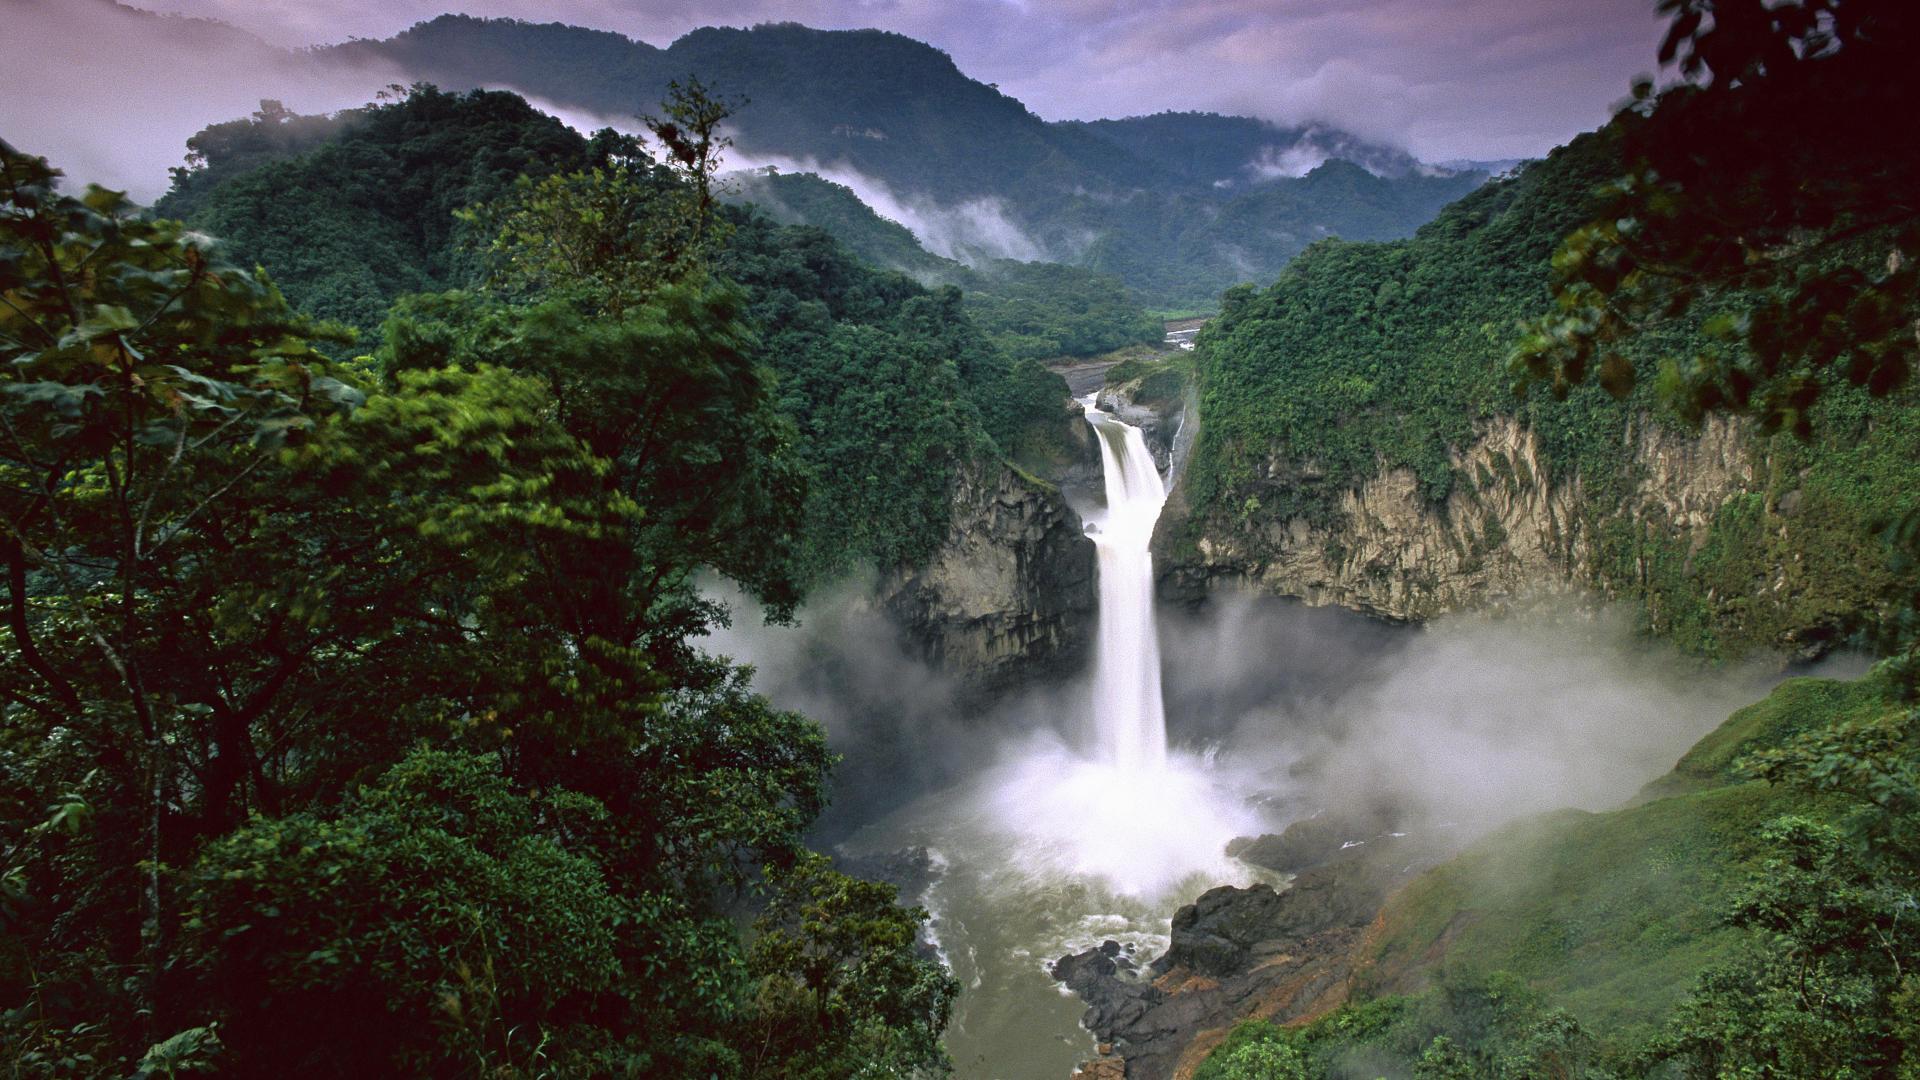 http://geographyofrussia.ru/wp-content/uploads/2009/04/San-Rafael-Falls-Quijos-River-Amazon-Ecuador.jpg